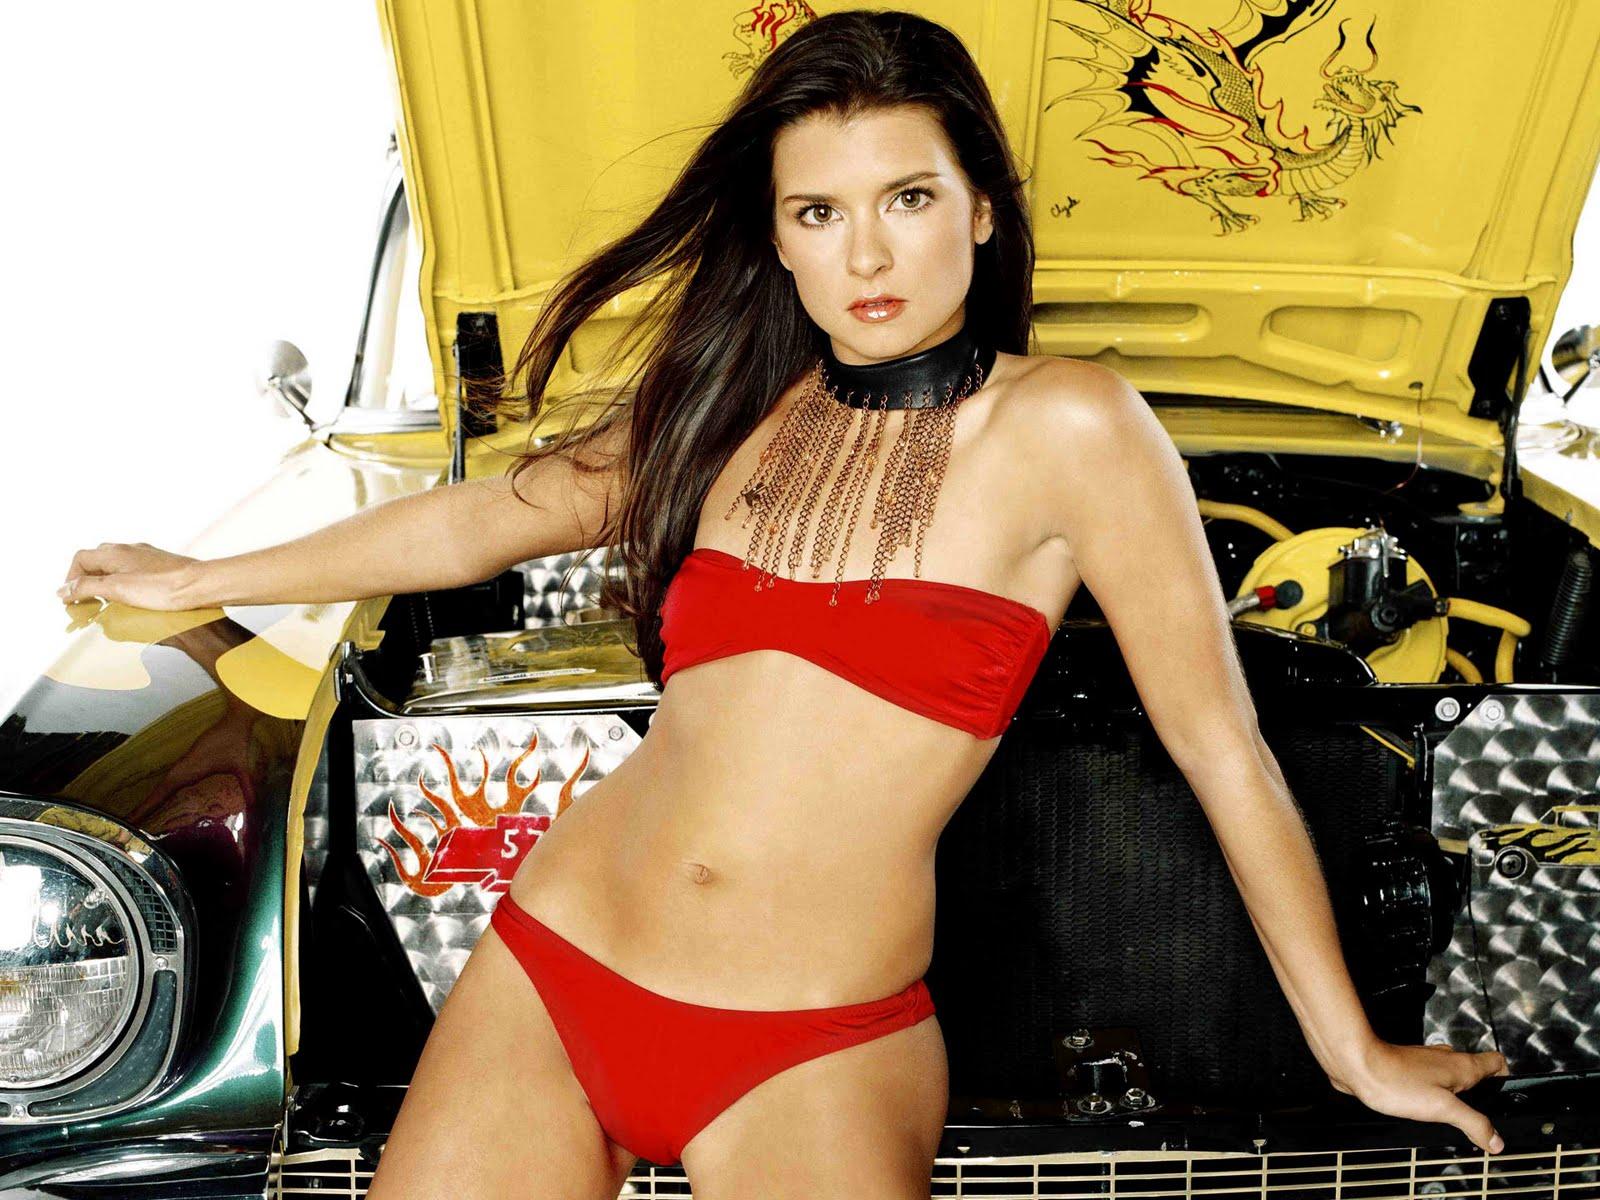 http://2.bp.blogspot.com/-7_XLHQp7jOk/Tjl4wh87DlI/AAAAAAAAA0Q/m0gmaQHWwG8/s1600/danica-patrick-indycar-swimsuit-18.jpg